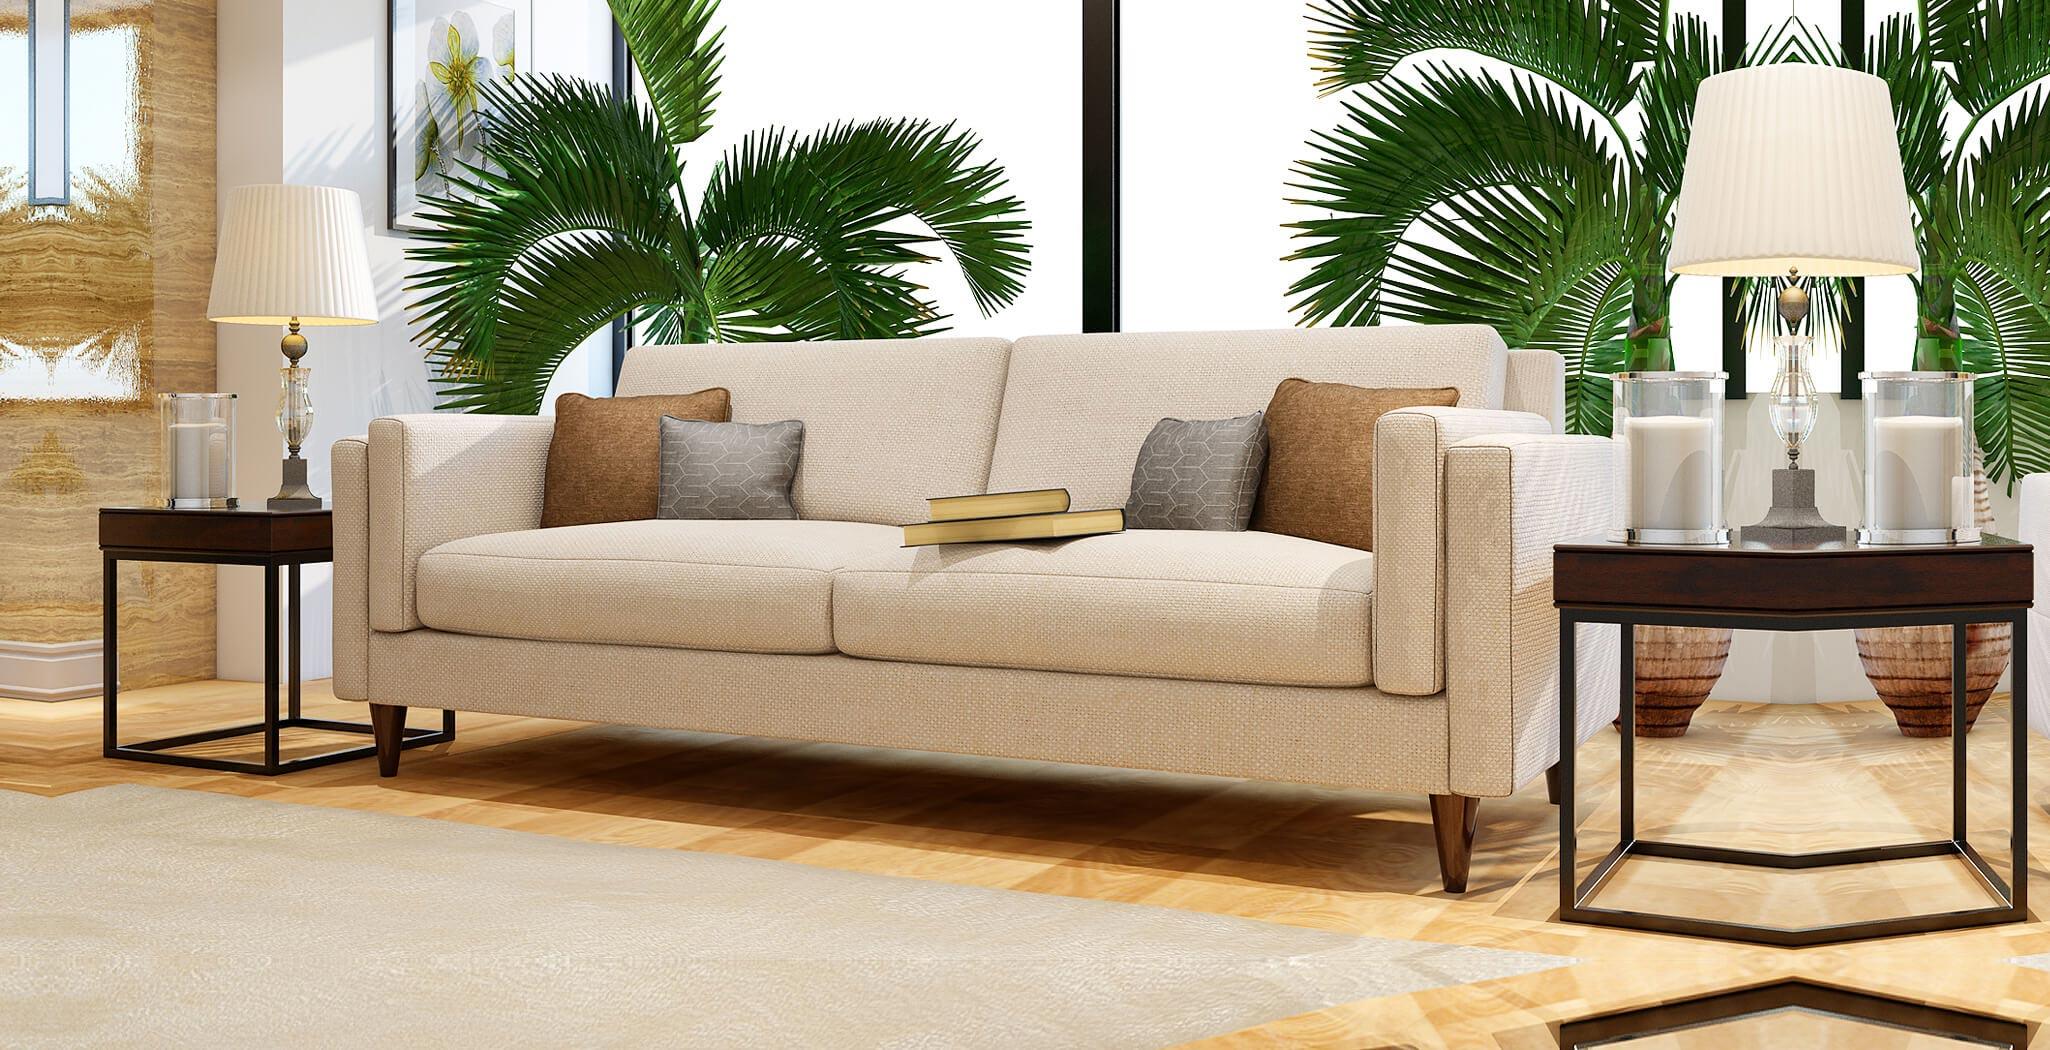 helsinki sofa furniture gallery 1